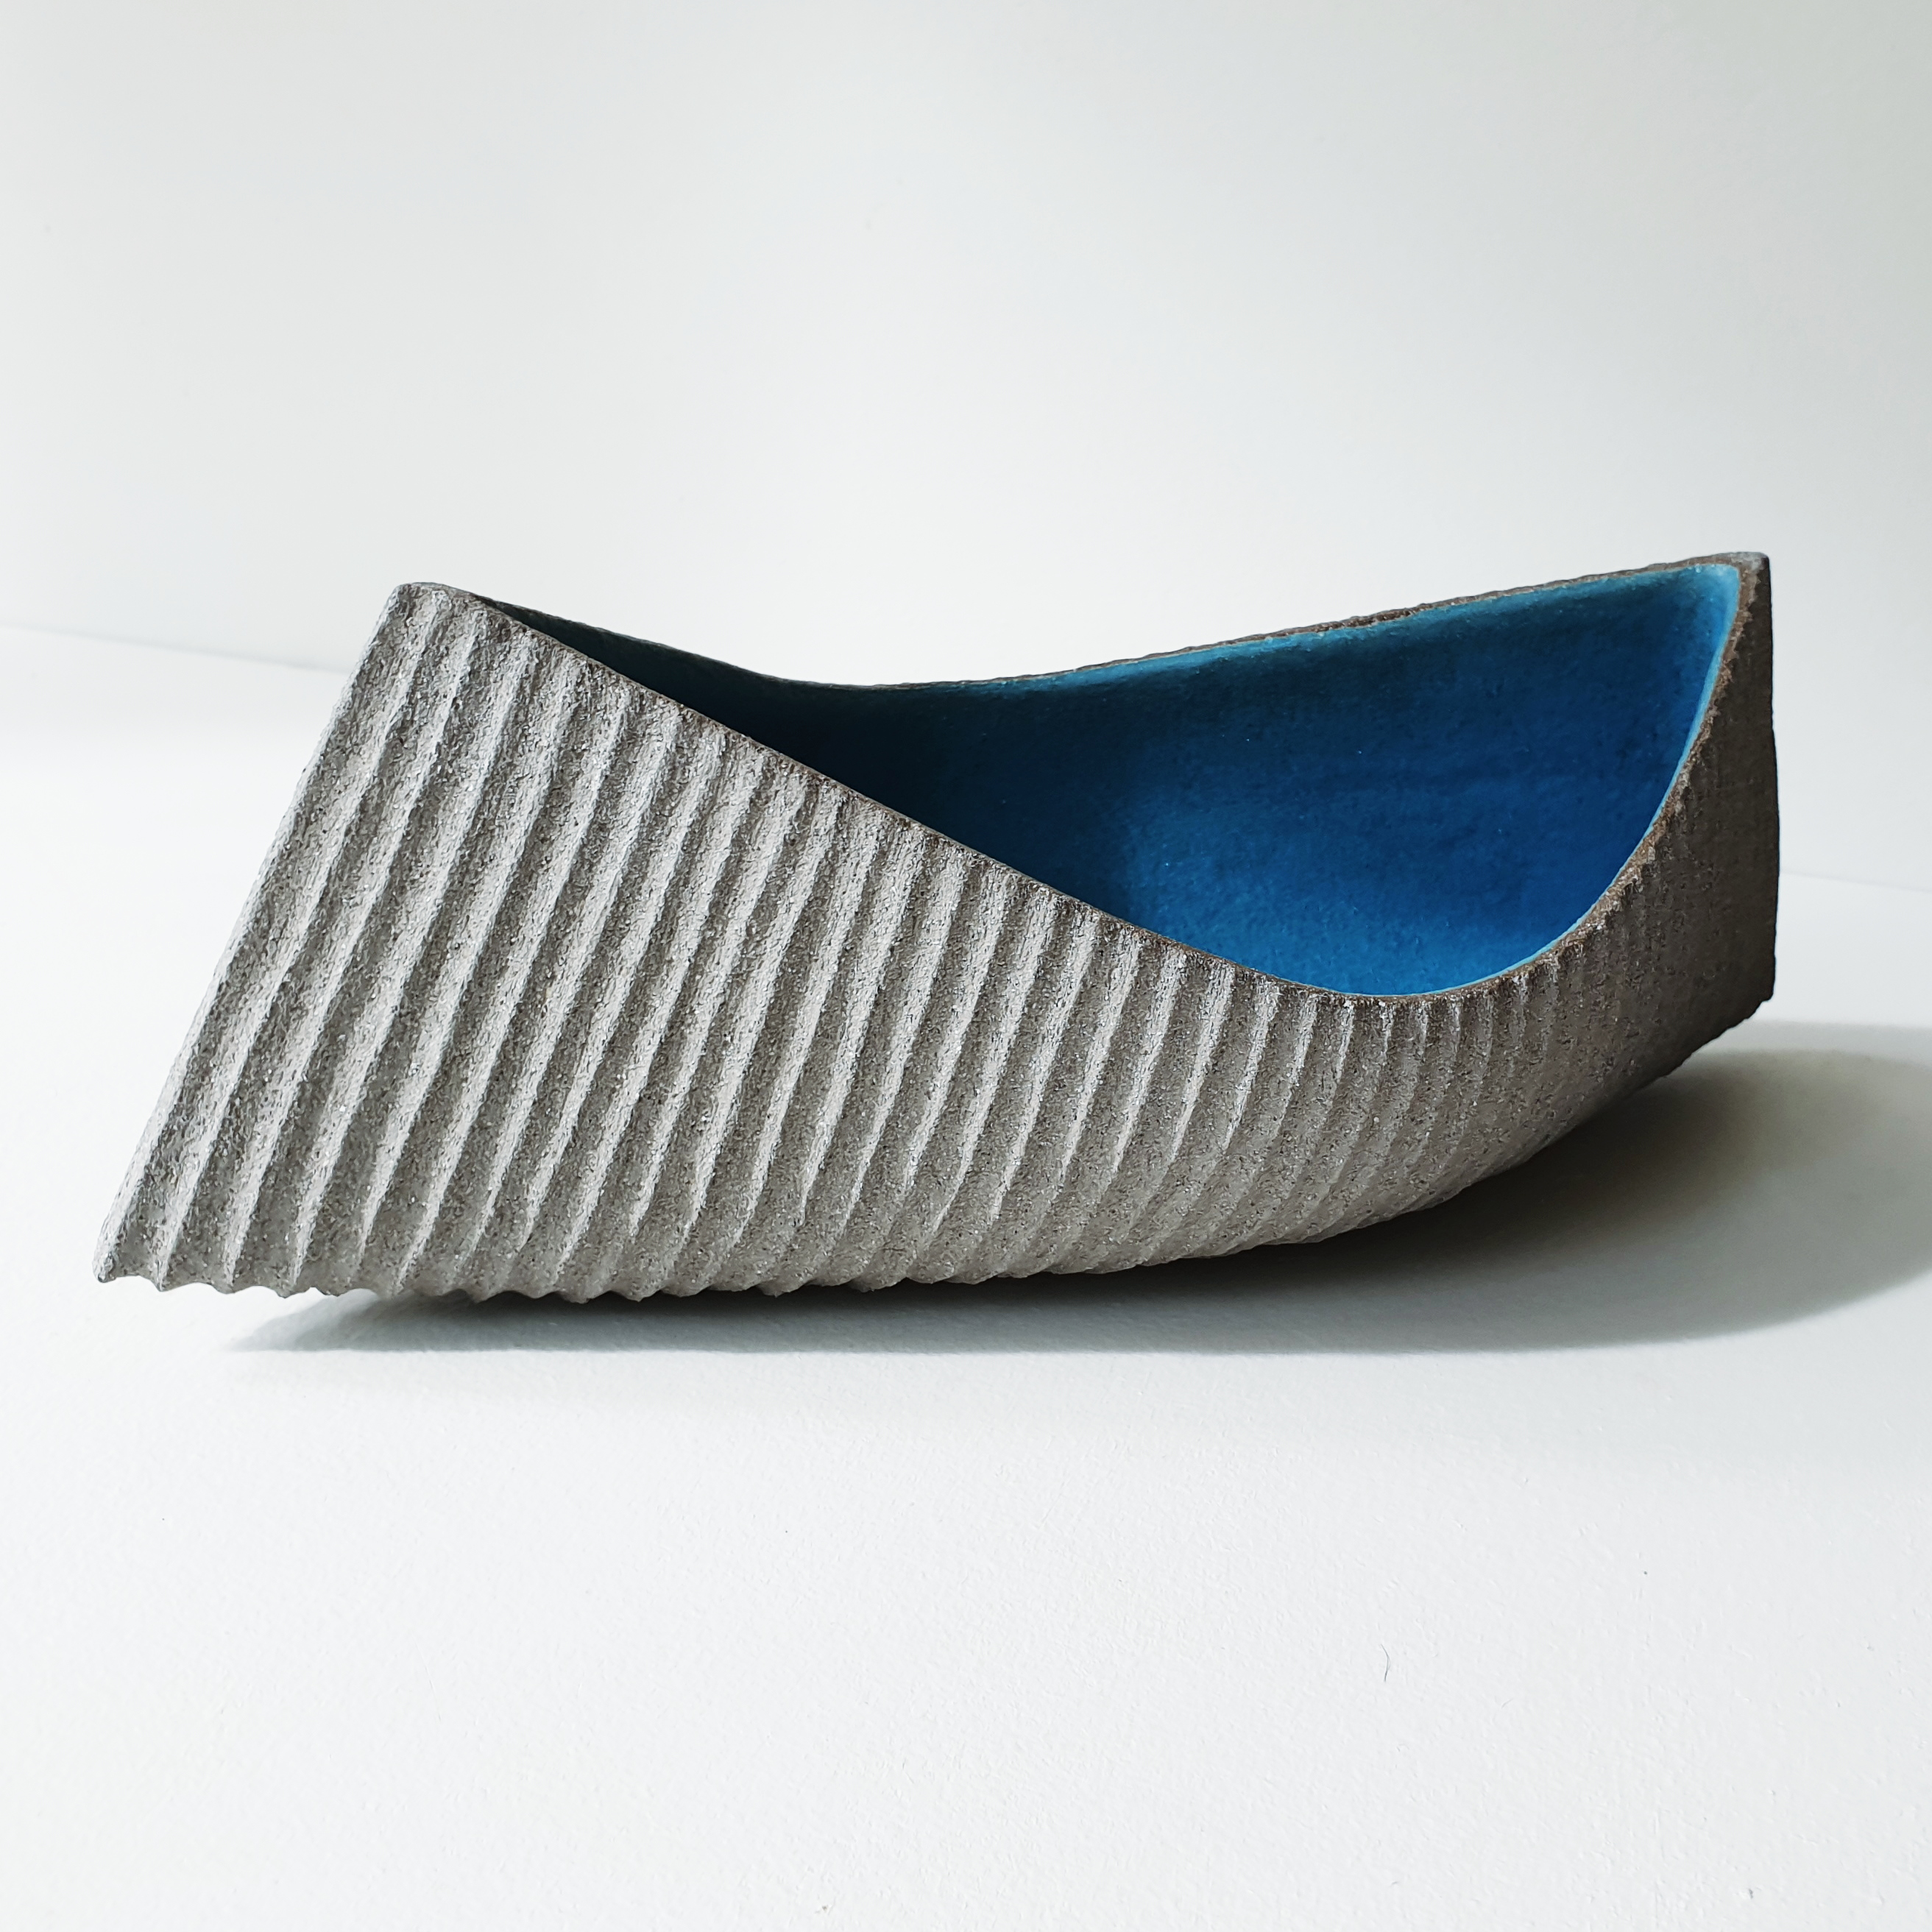 Michele Bianco. Drift vessel (sky blue)